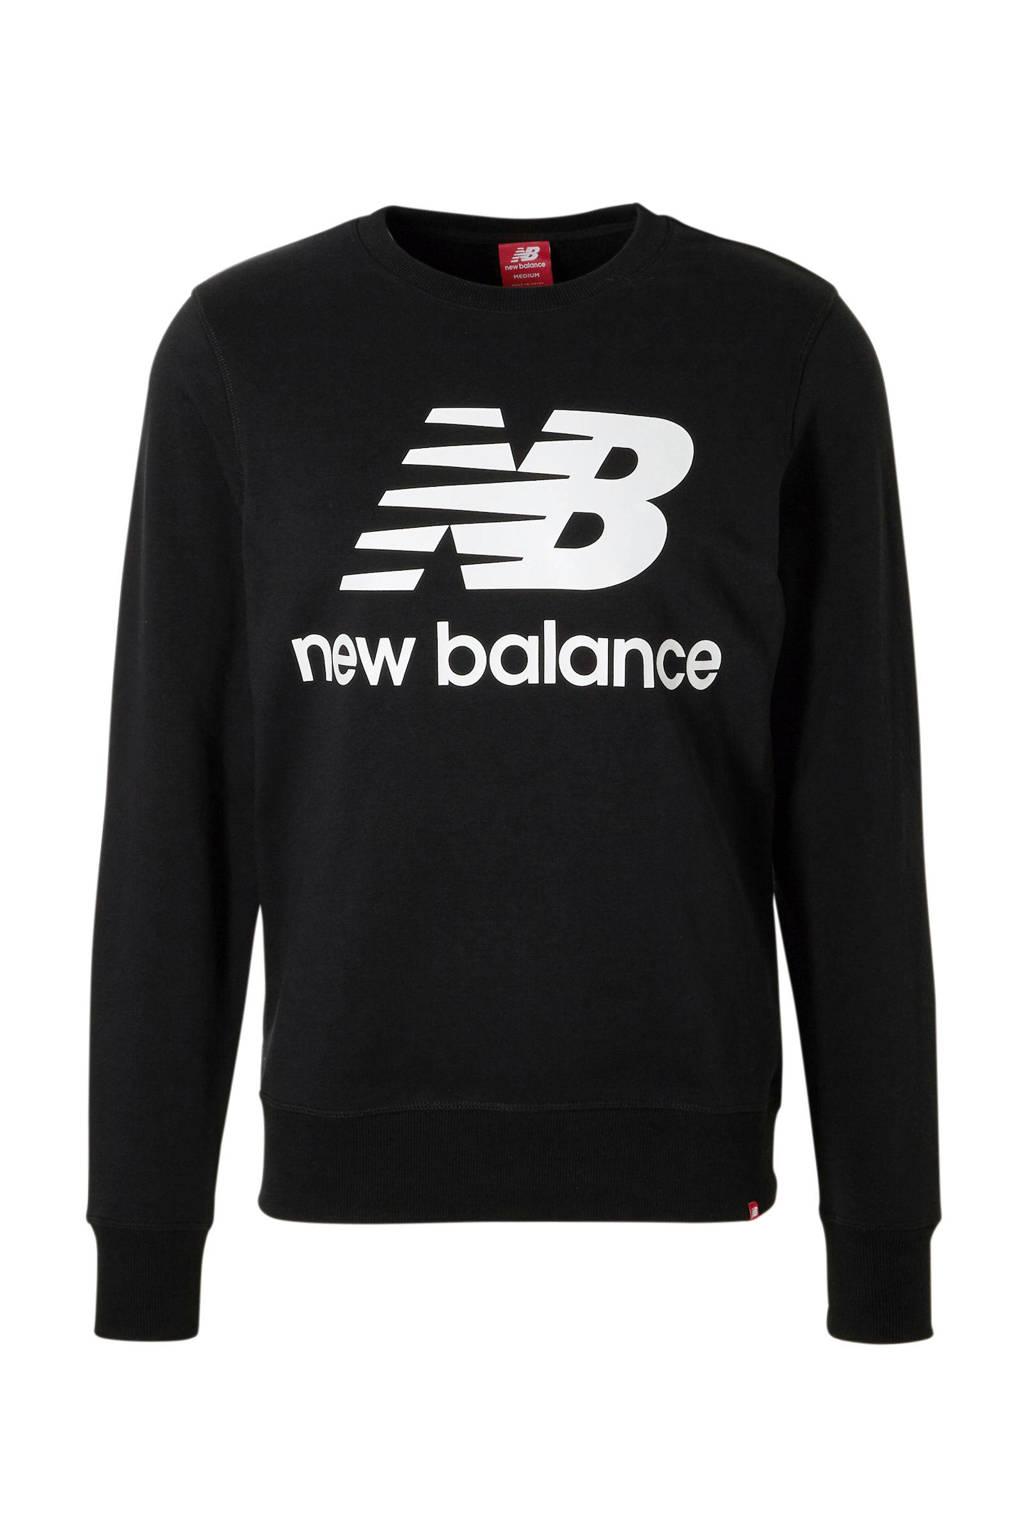 New Balance   sweater zwart, Zwart/wit